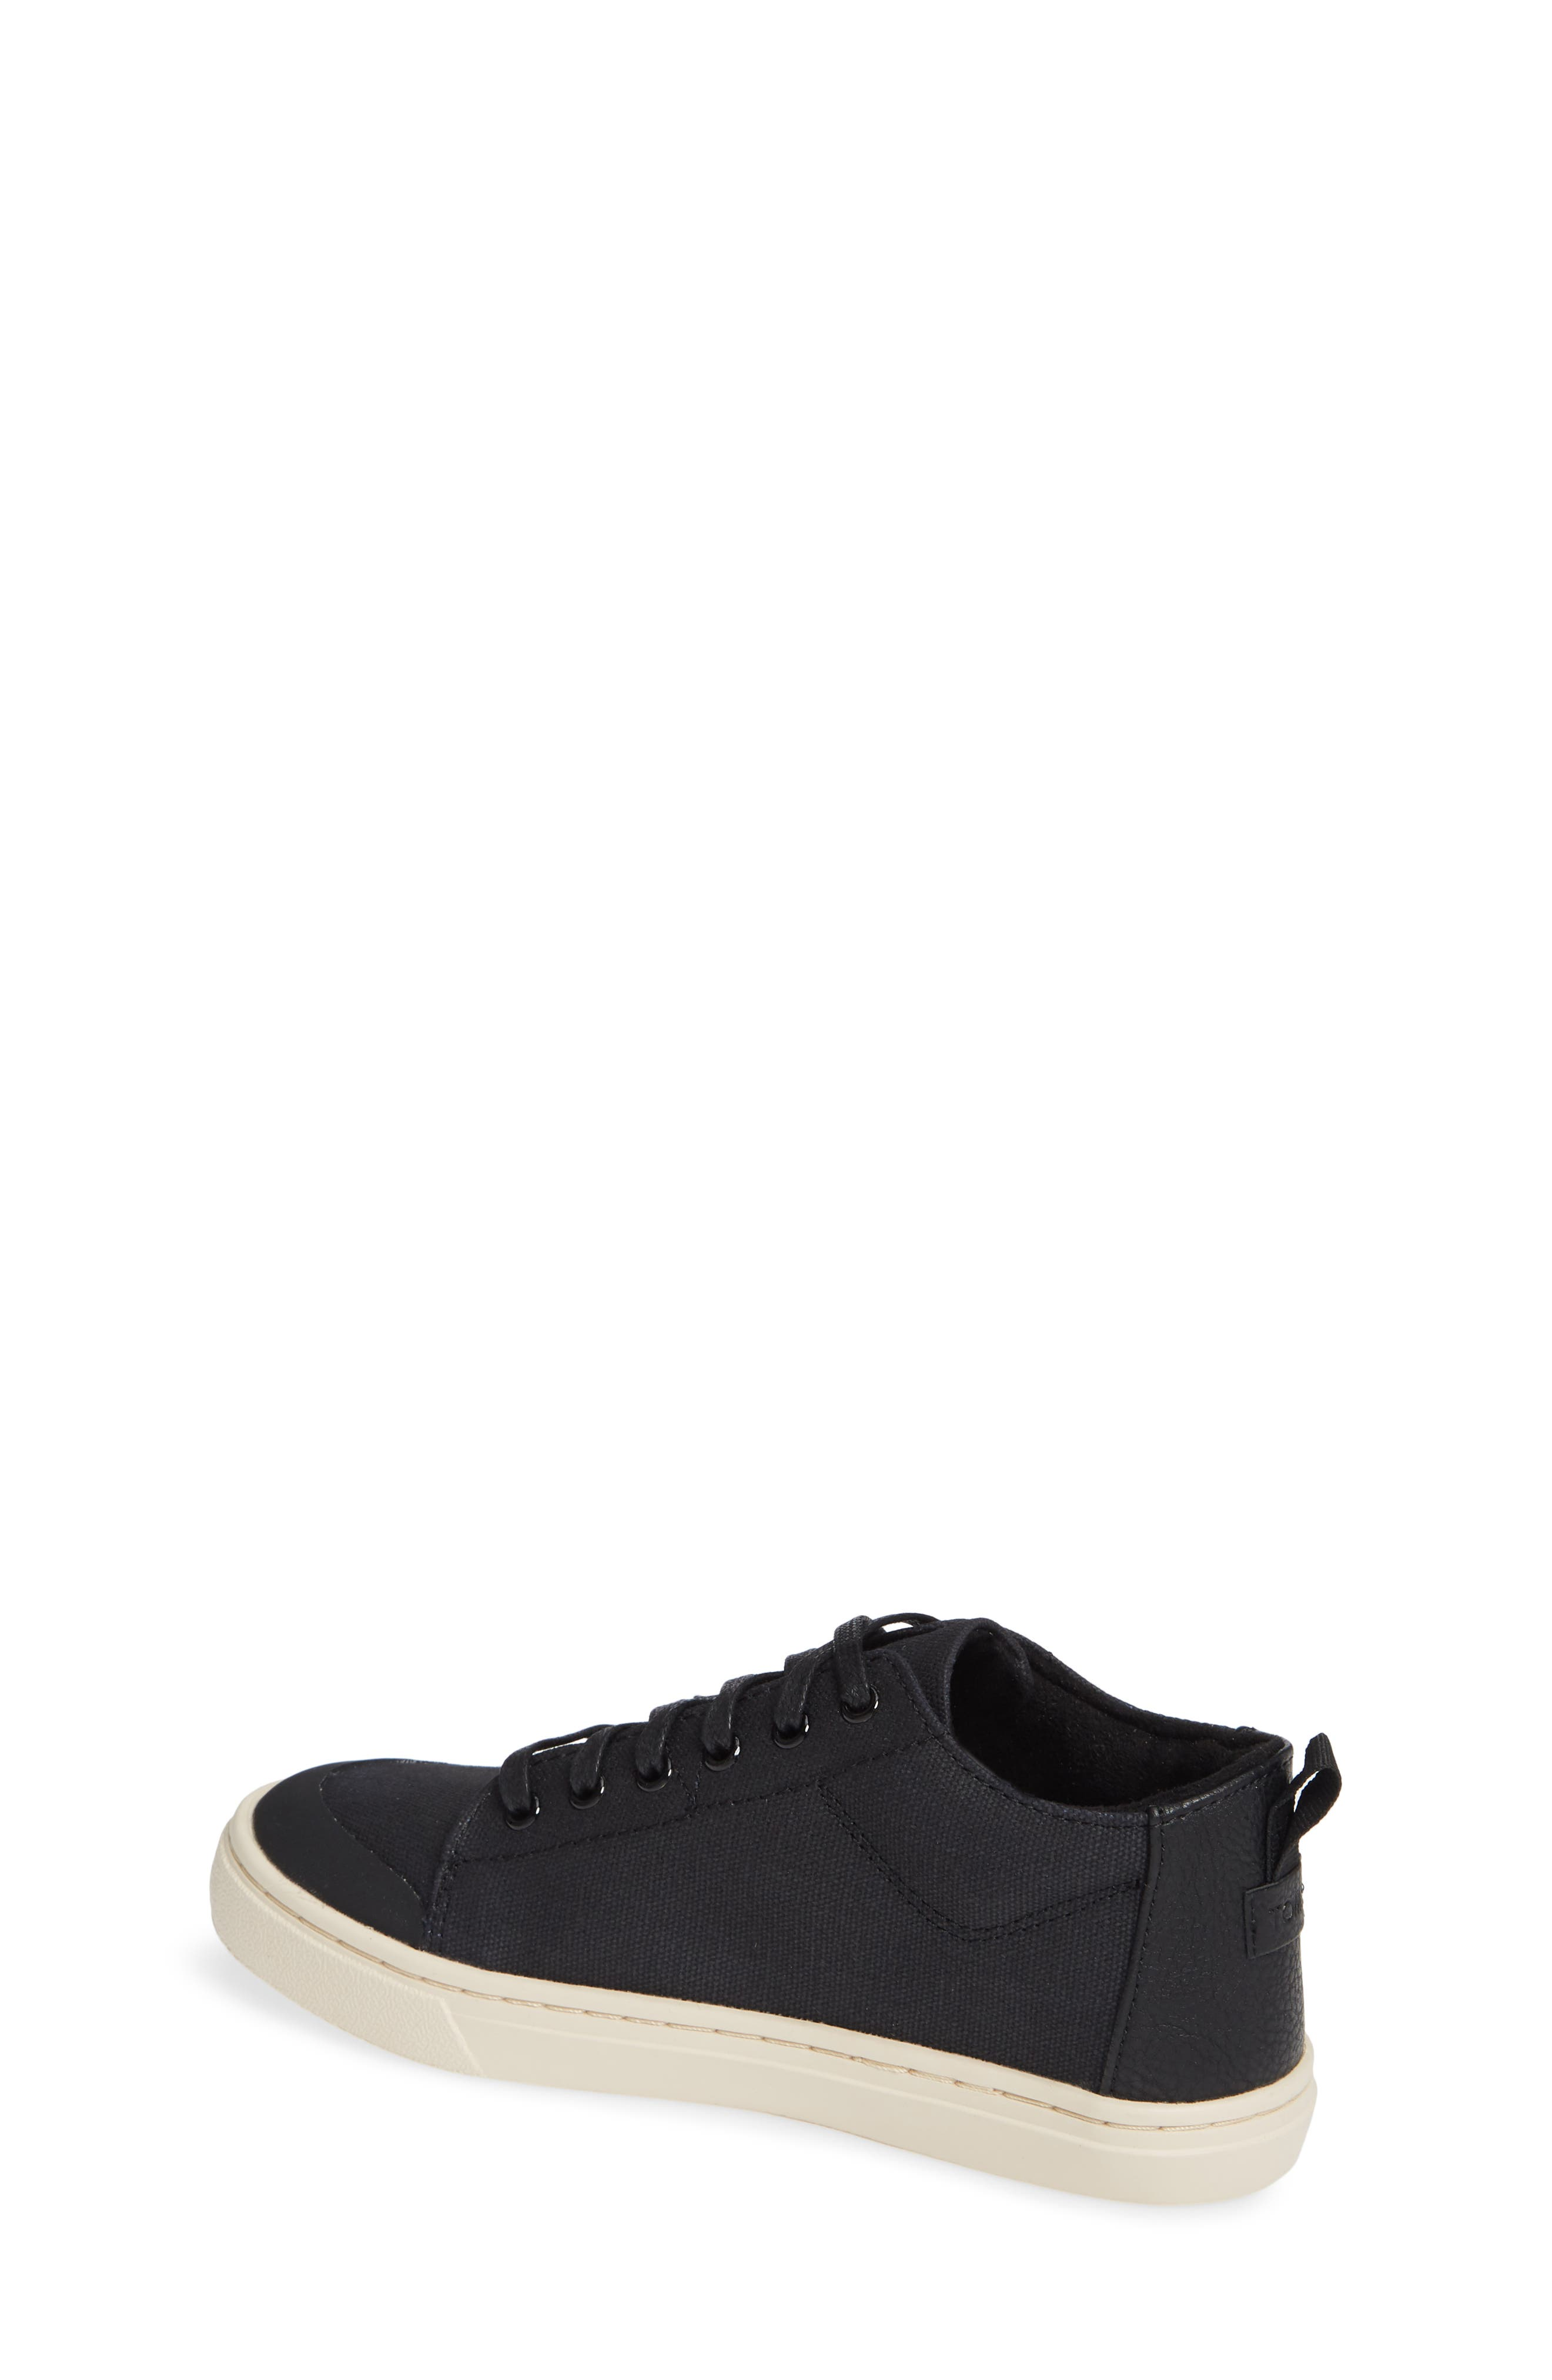 Lenny Mid Top Sneaker,                             Alternate thumbnail 2, color,                             BLACK TEXTURAL CANVAS